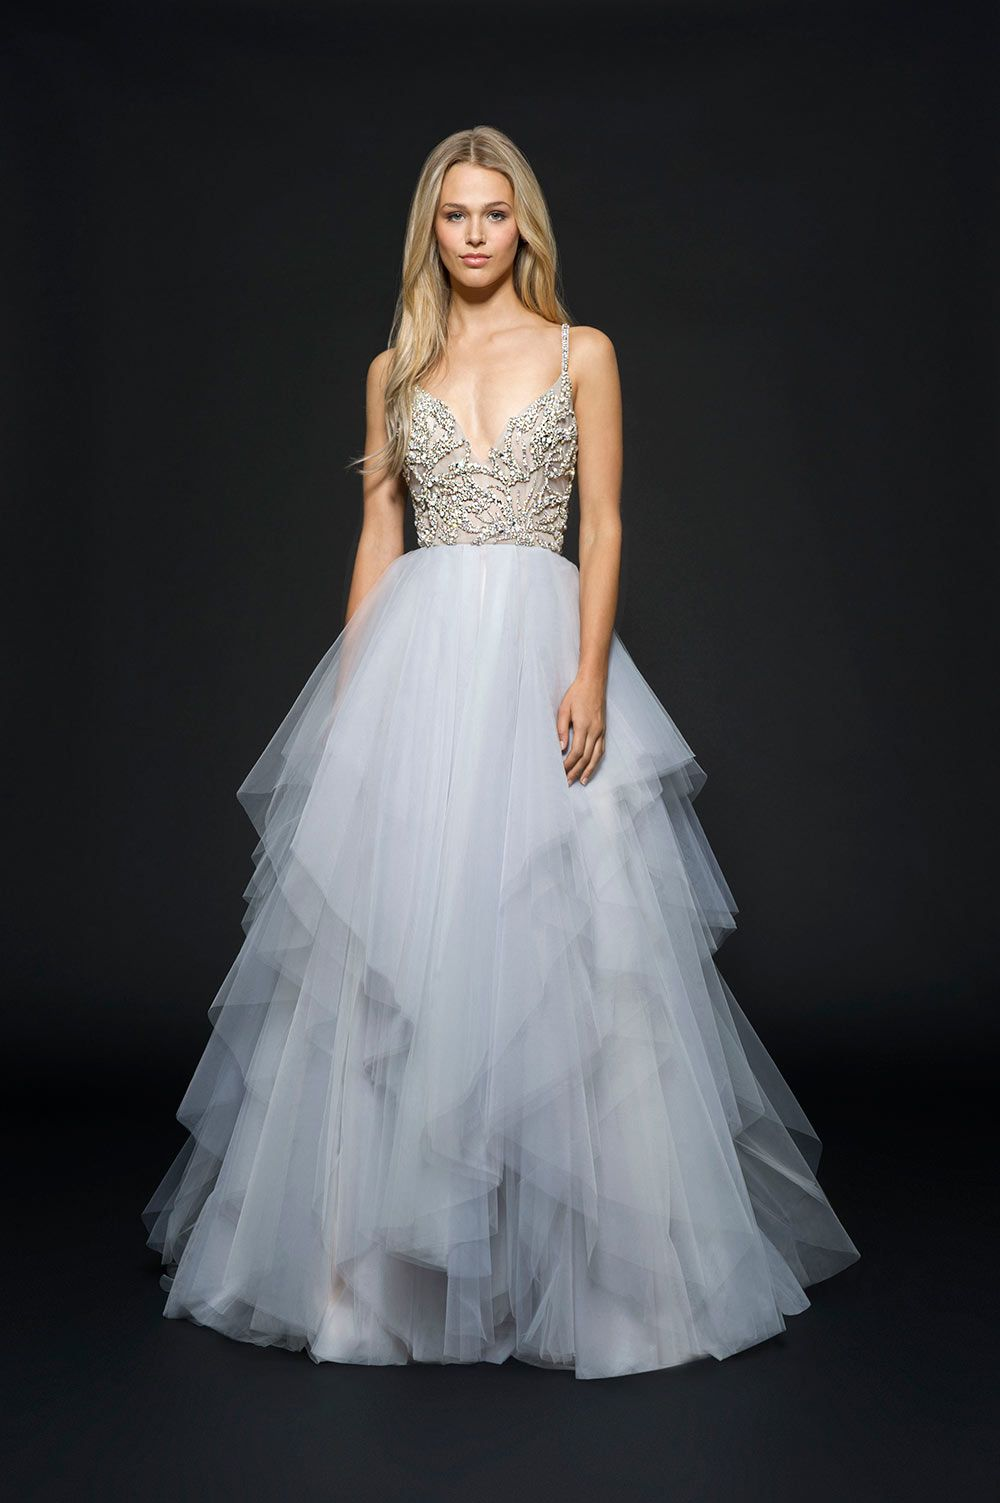 Stylish Silver Wedding Dresses for Modern Brides | Vestidos novia ...